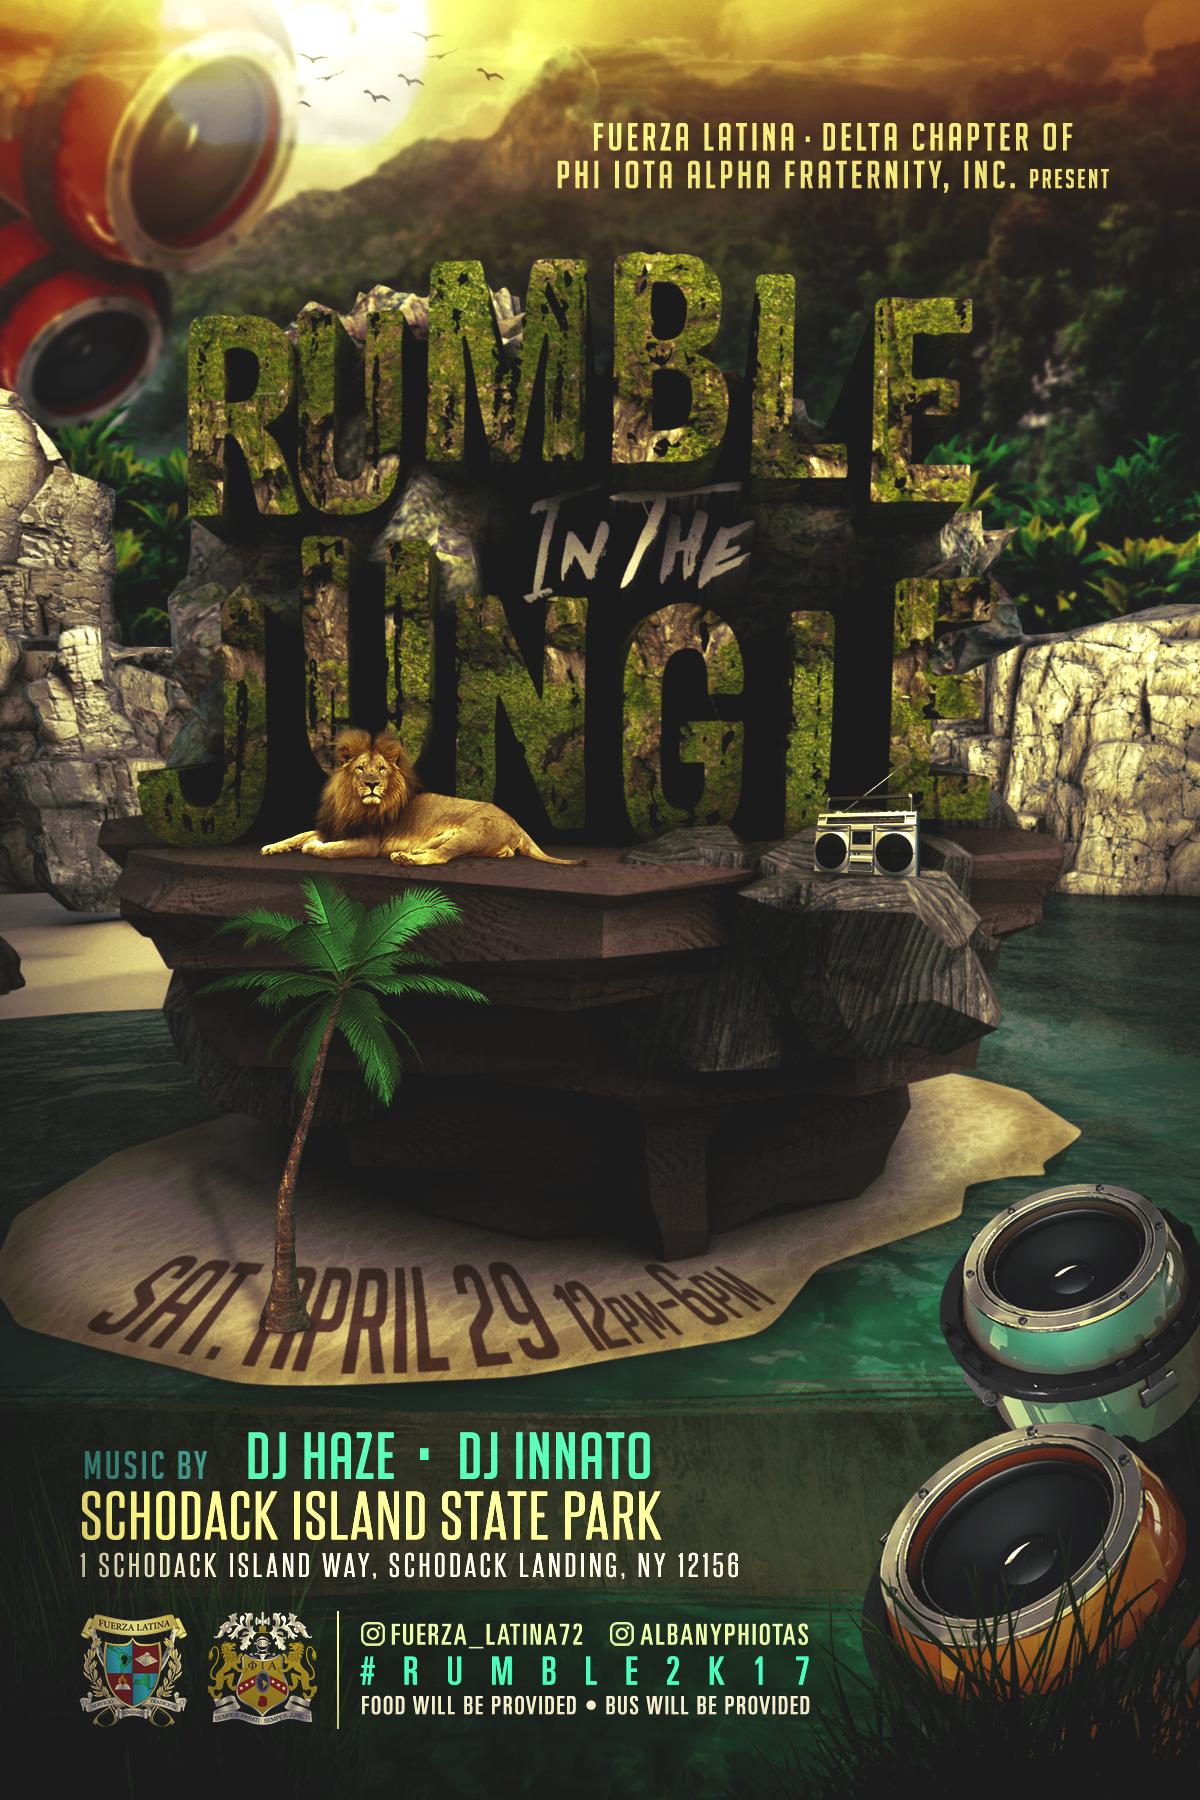 jungle fuerza latina latino Albany University College Event social cinema4d festival Nature 3D typography